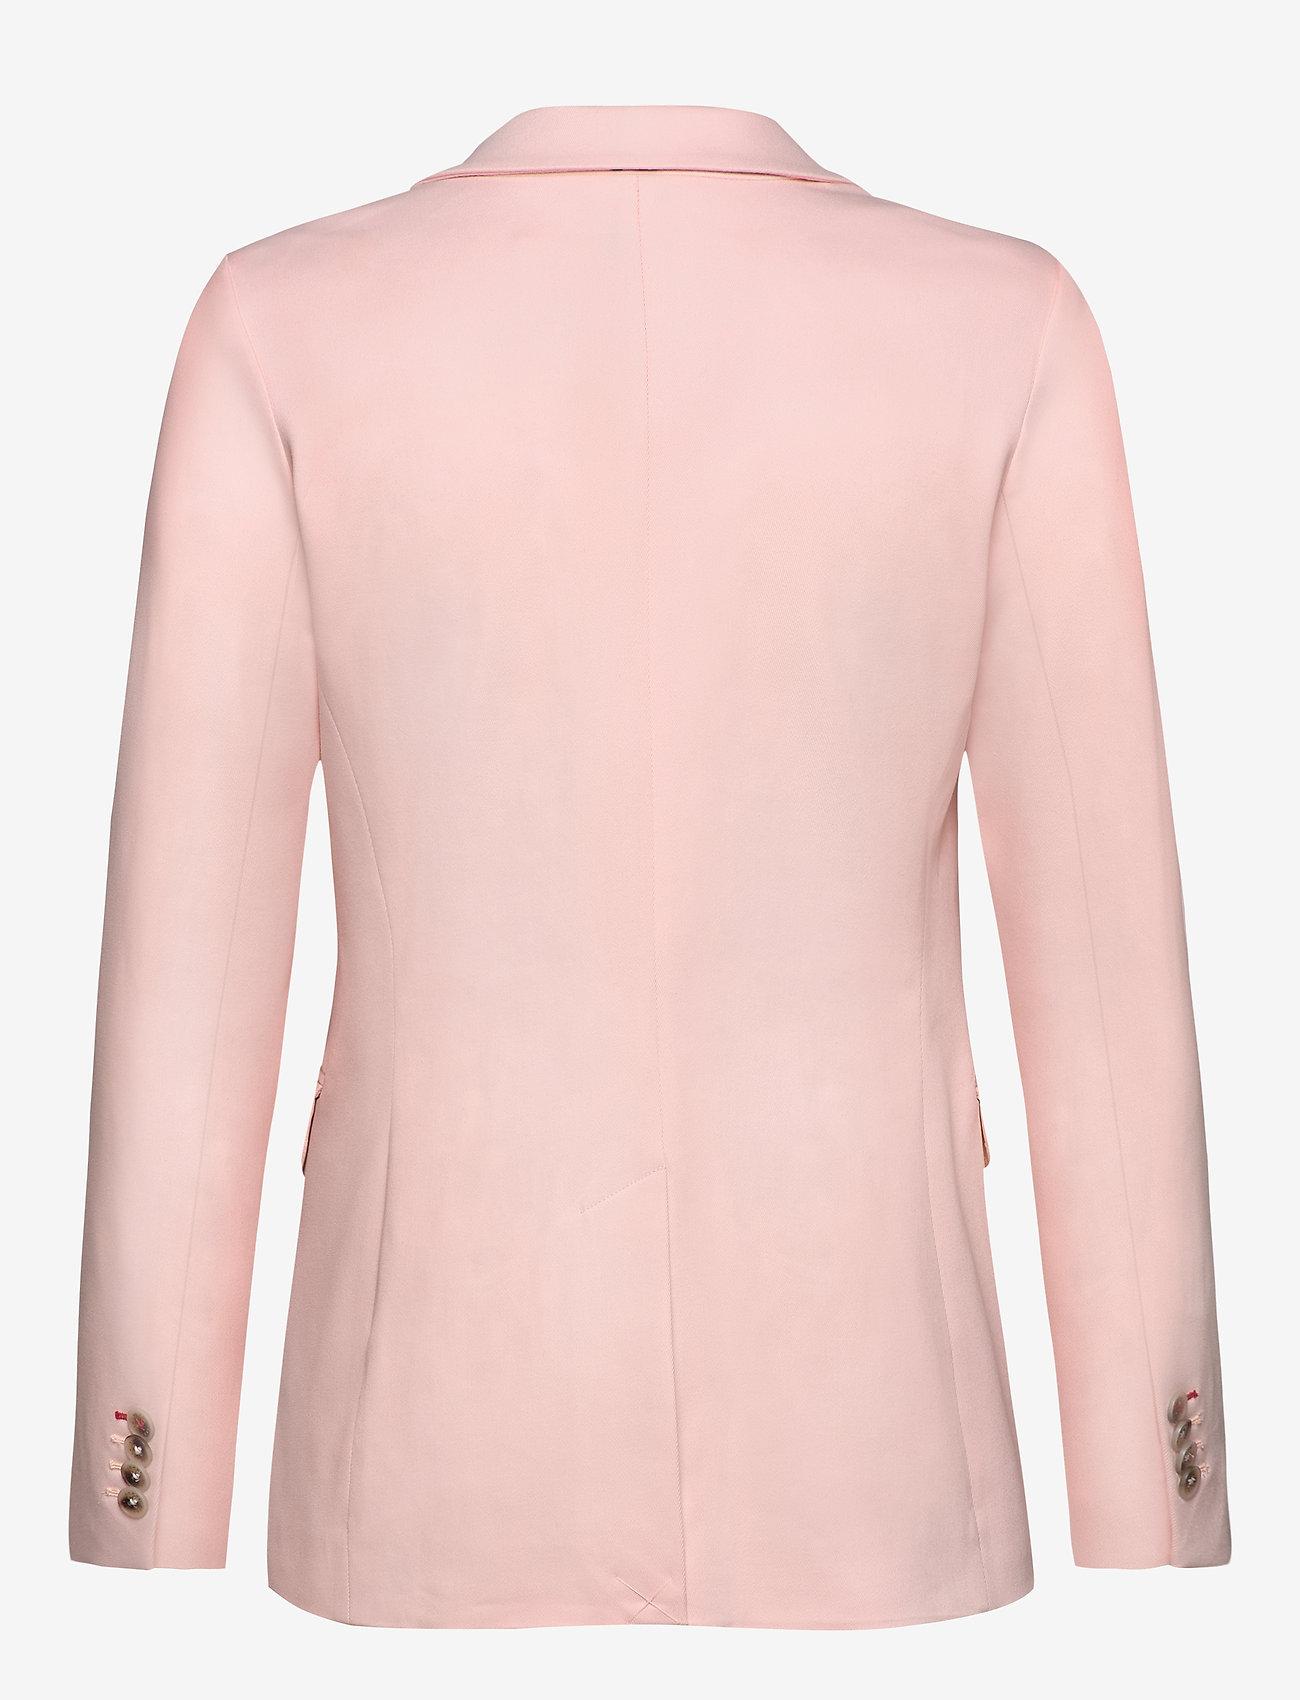 Tommy Hilfiger - COTTON PASTEL SB BLA - blazers - pale pink